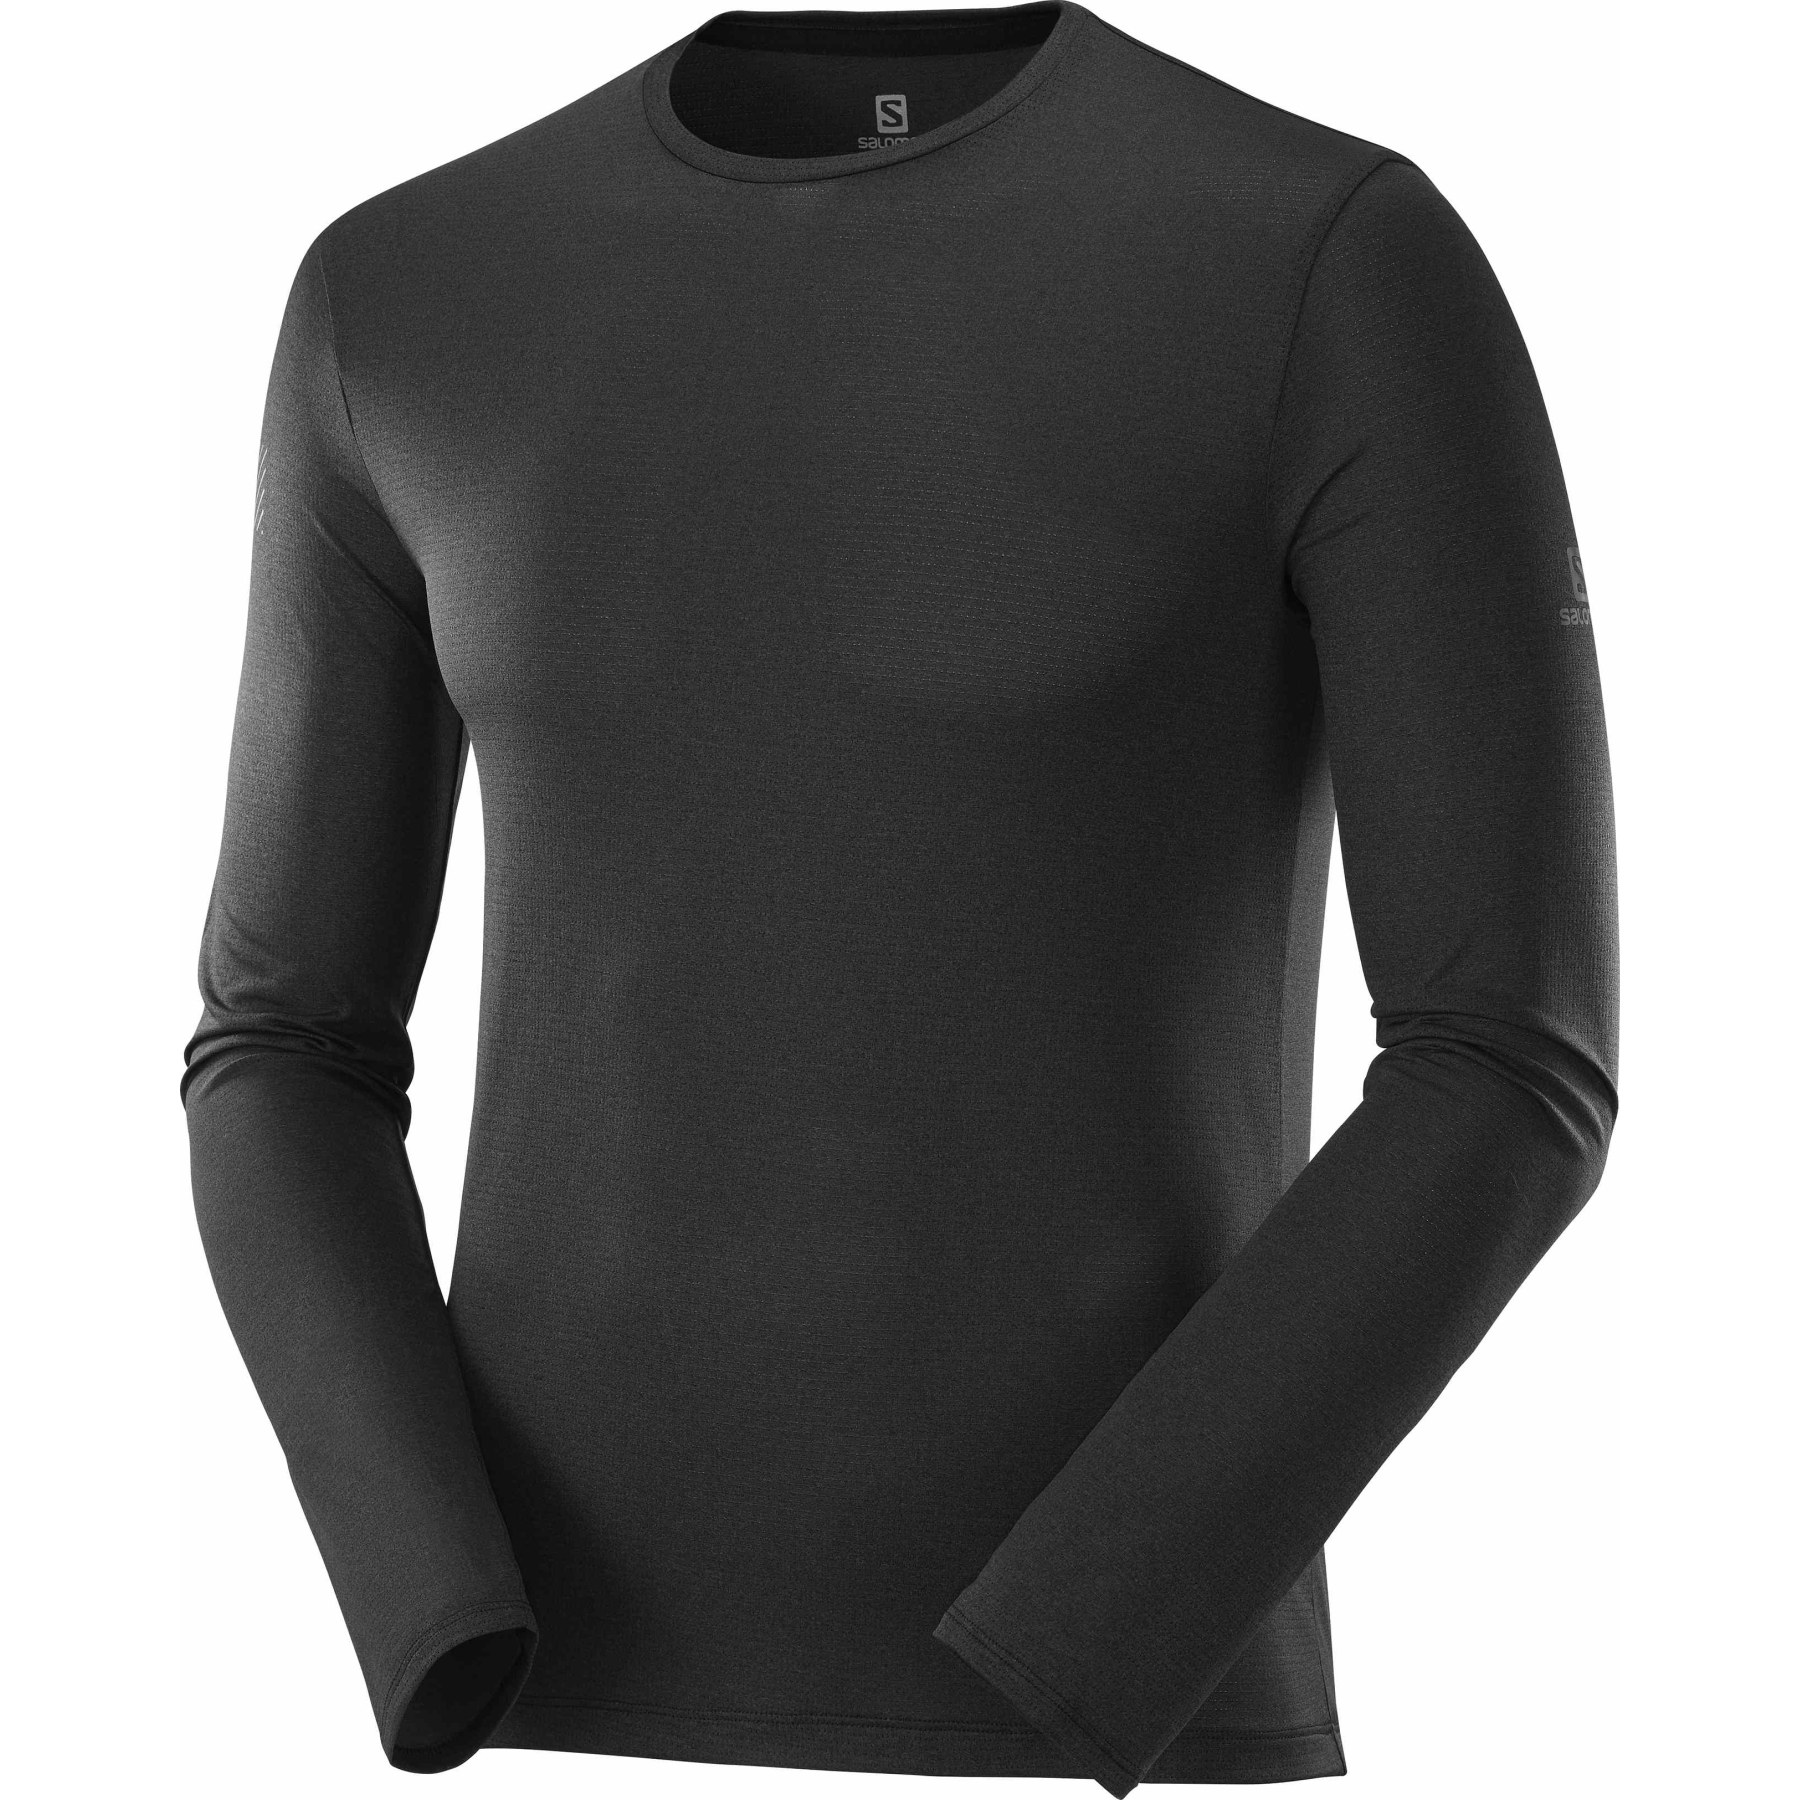 Foto de Salomon Agile LS Camisa de manga larga - negro